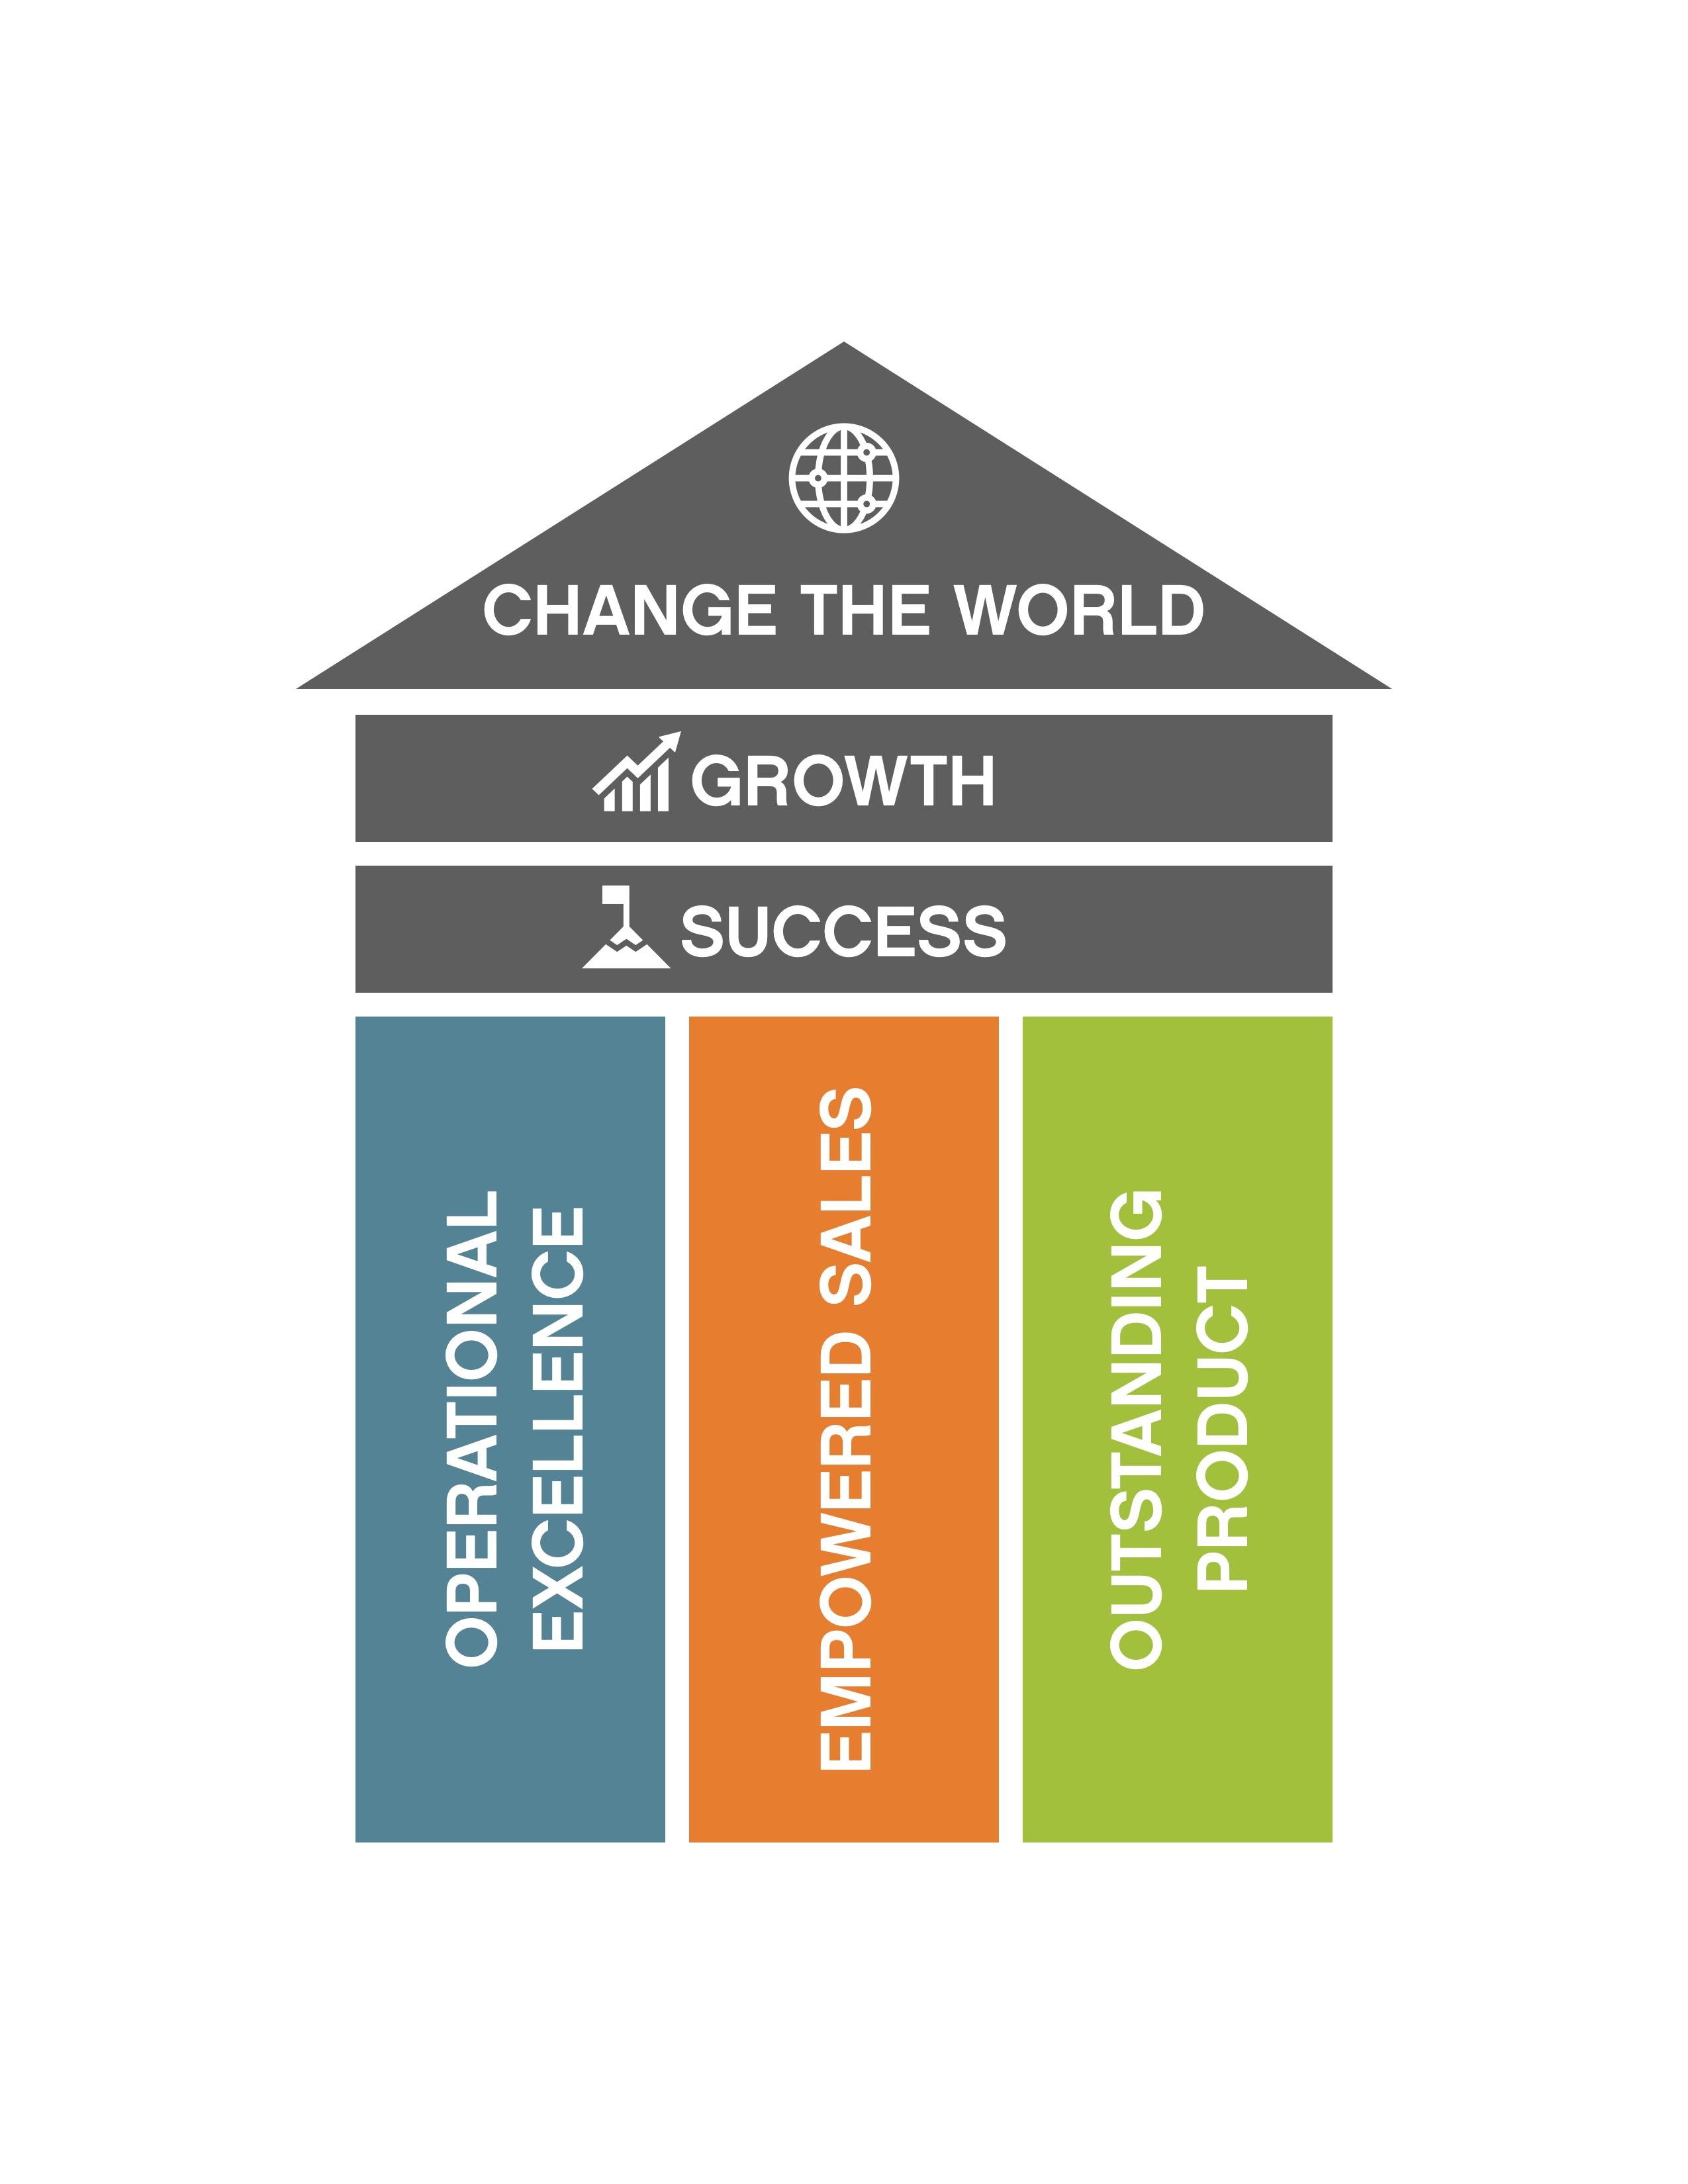 Growth, Success, Change the World